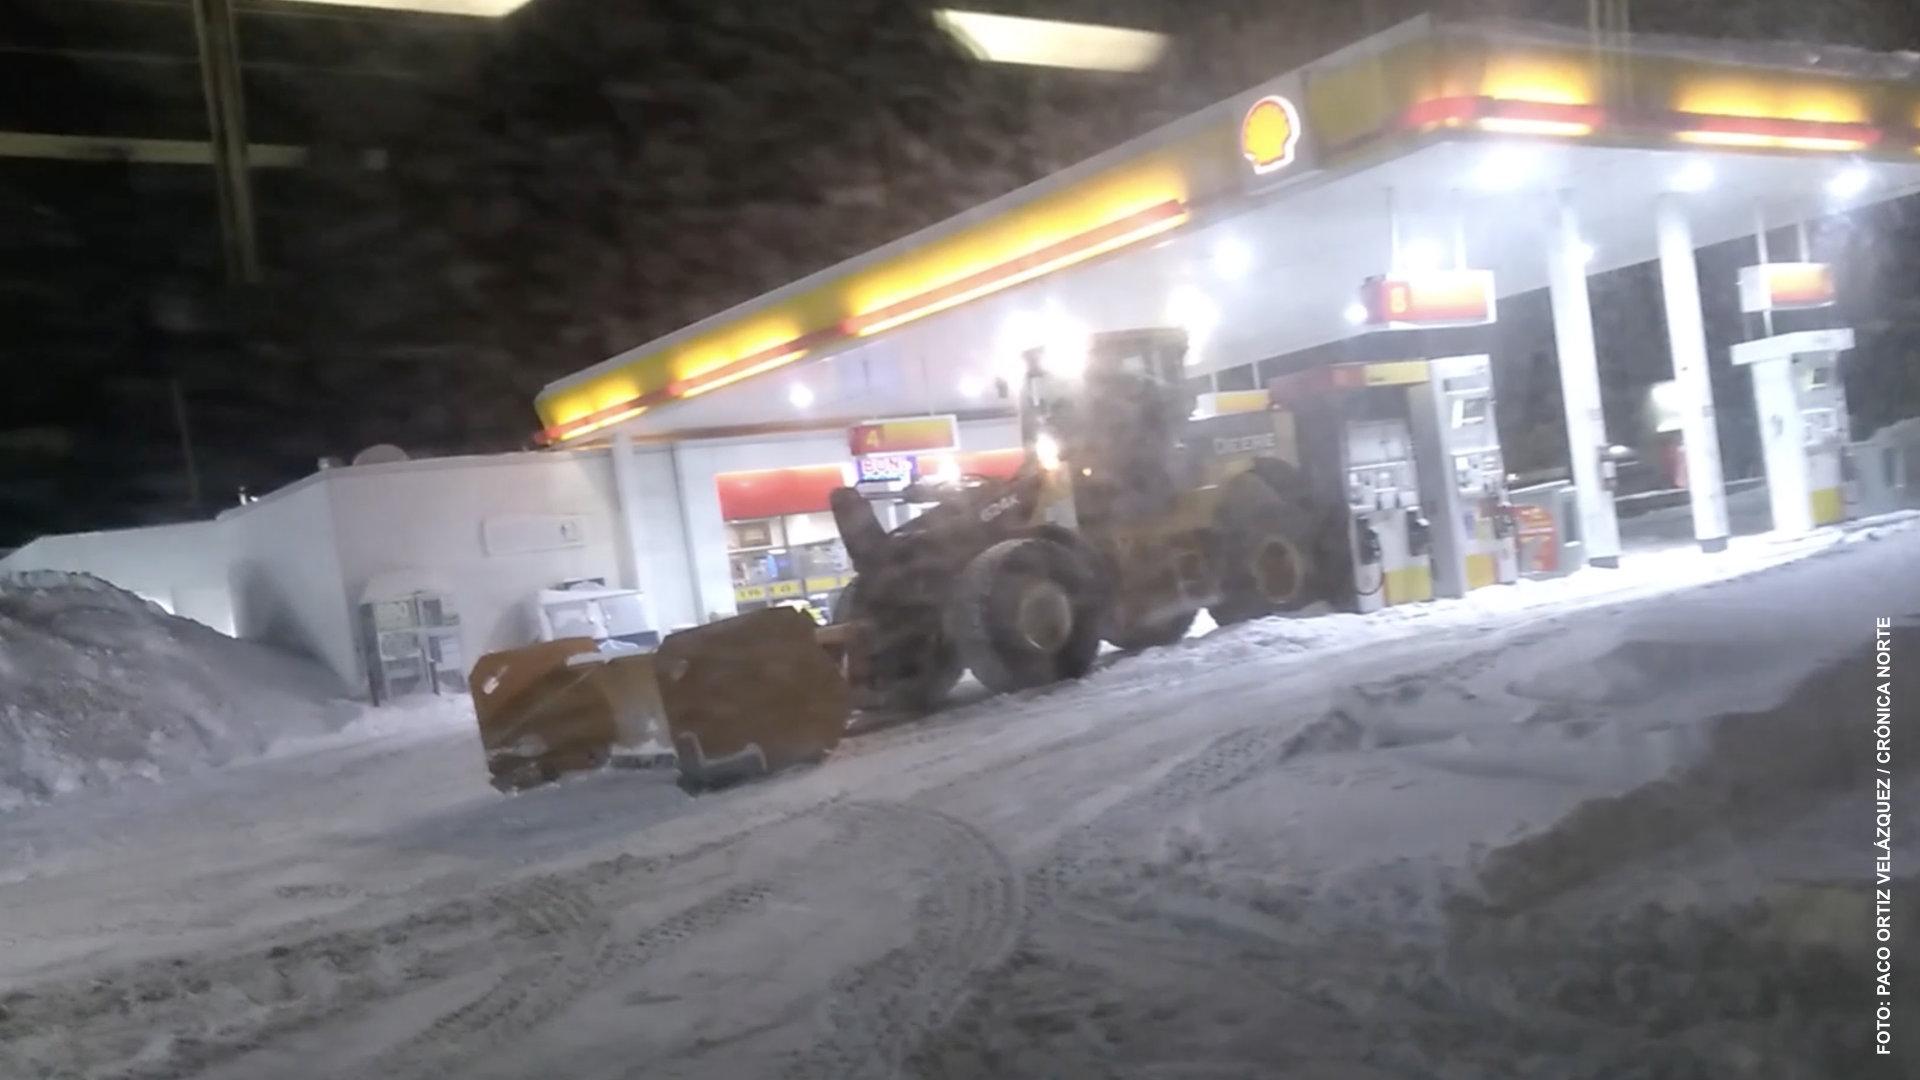 Pala mecánica de limpieza de nieve embiste a autobús